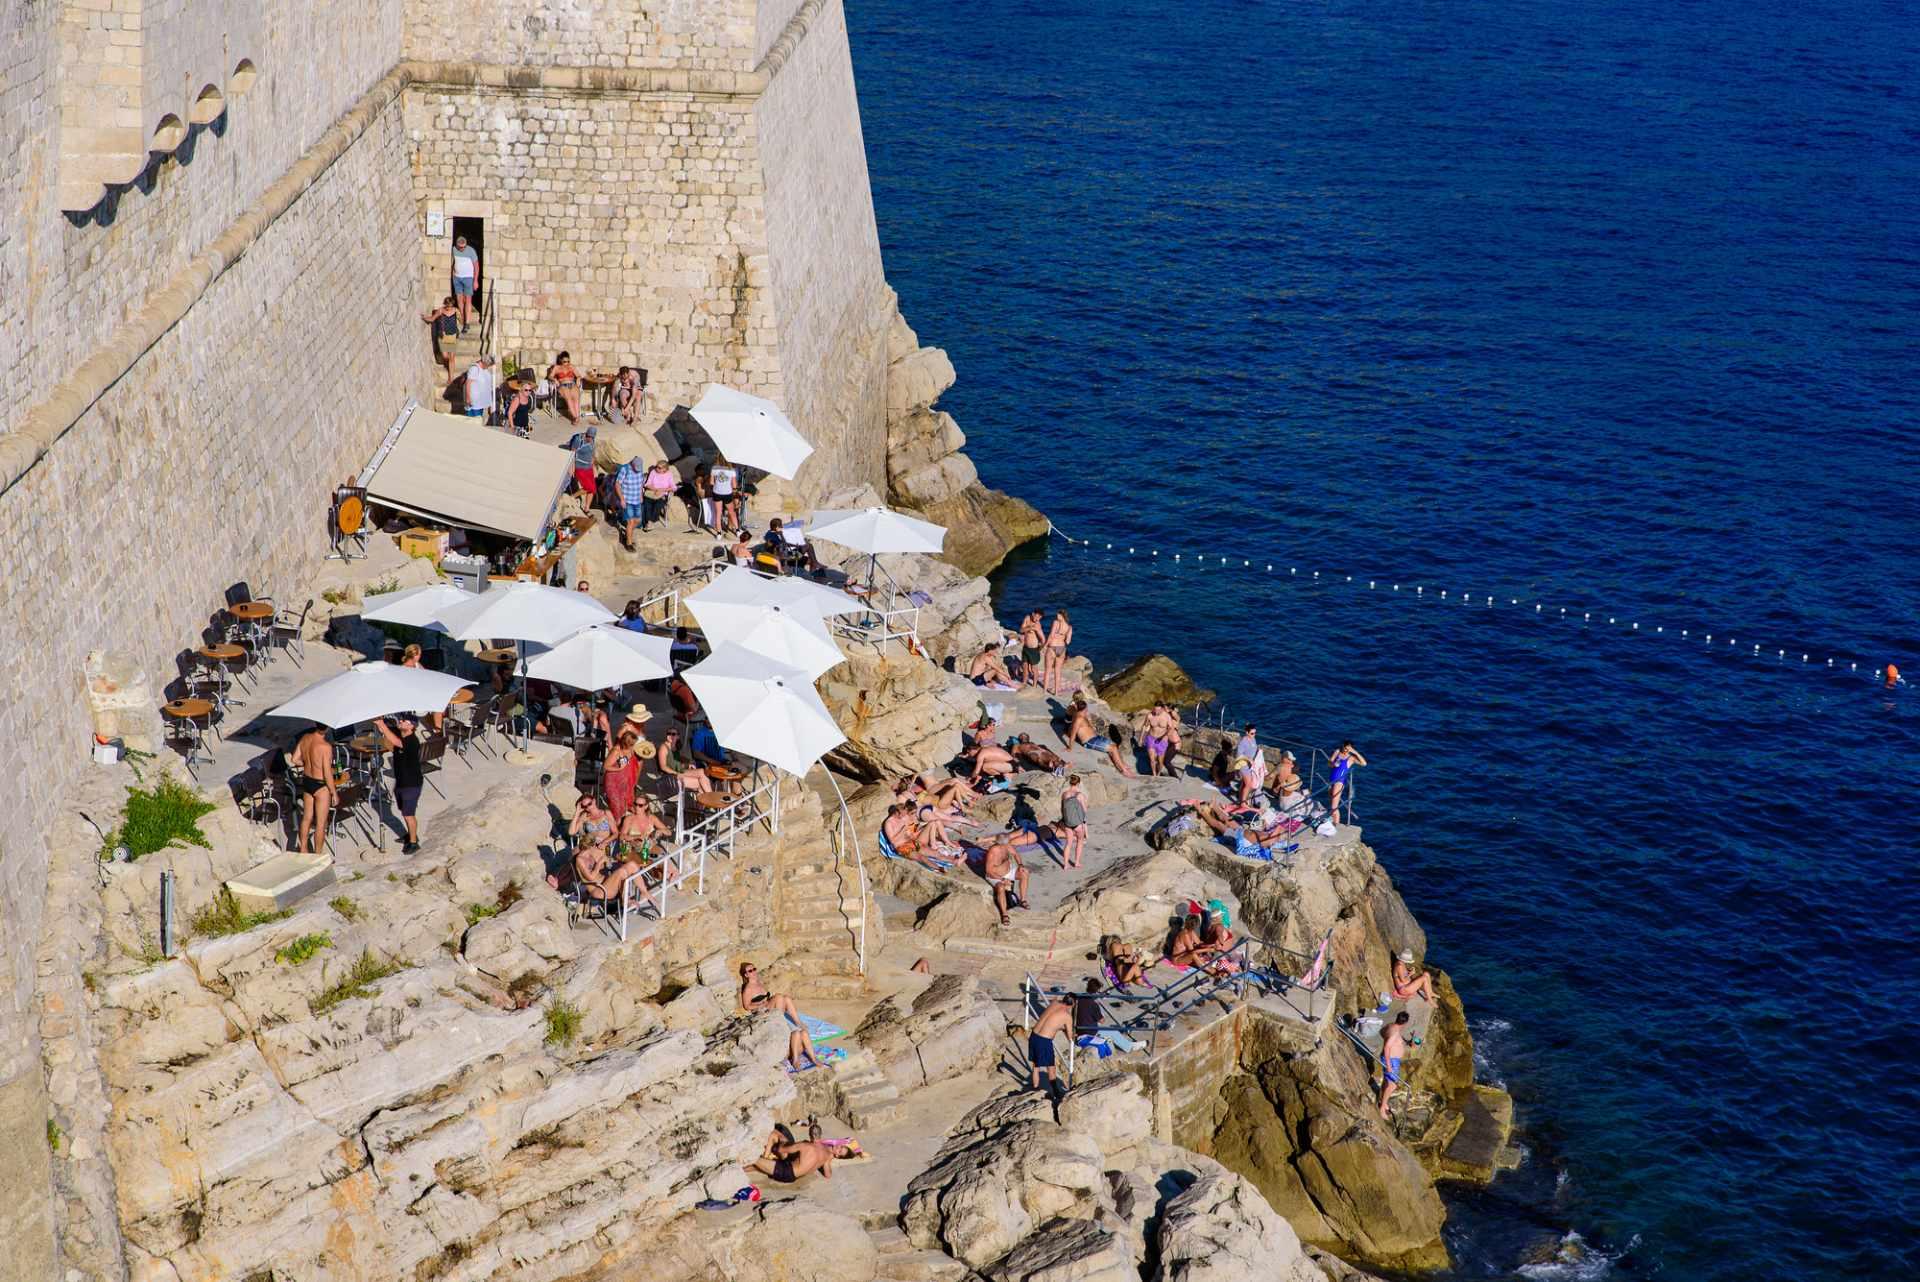 people-drinking-in-sun-in-cliffside-buža-bar-3-days-in-dubrovnik-itinerary